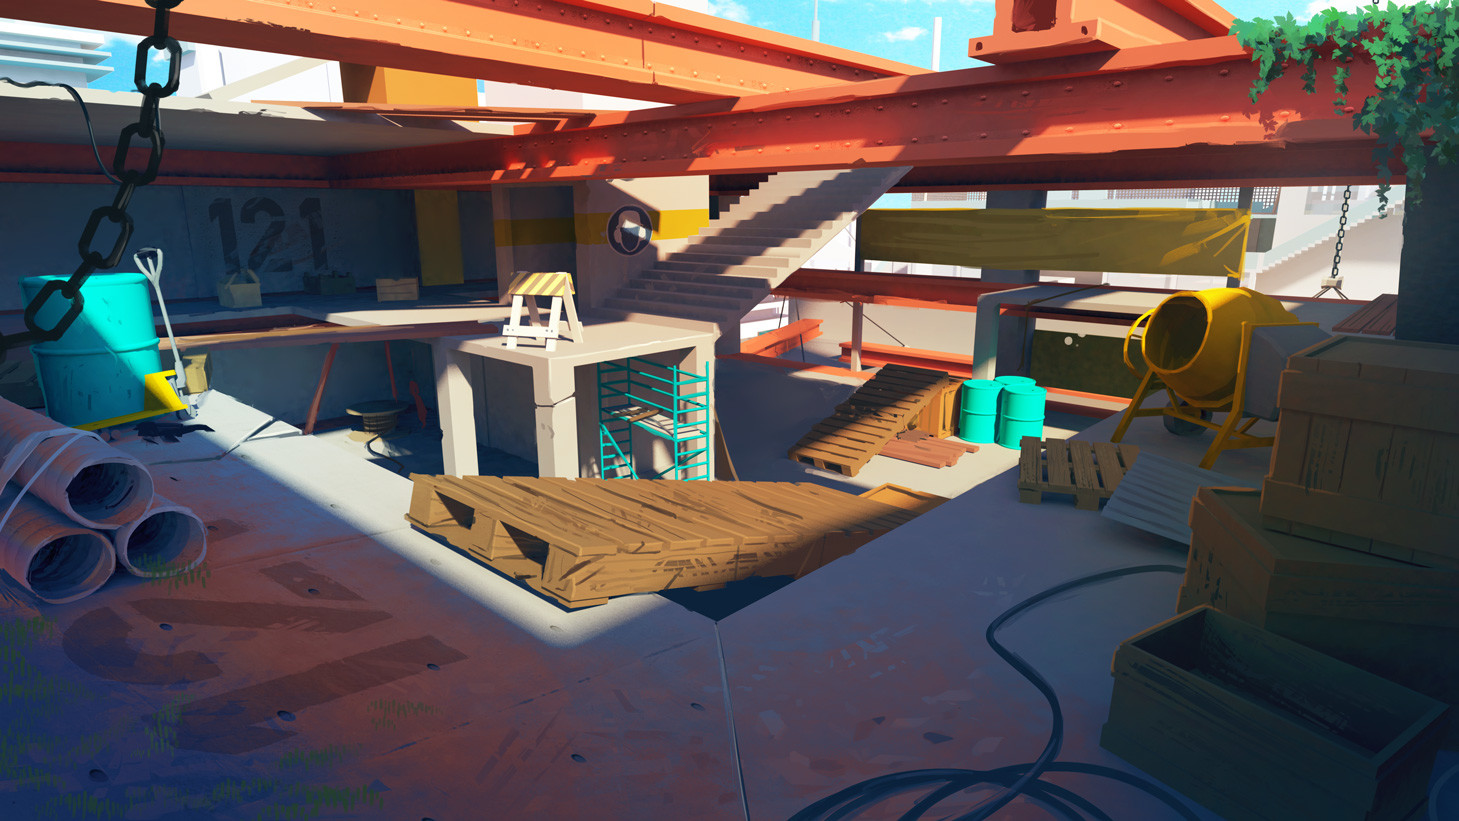 Streamline concept-art : high rise constructions